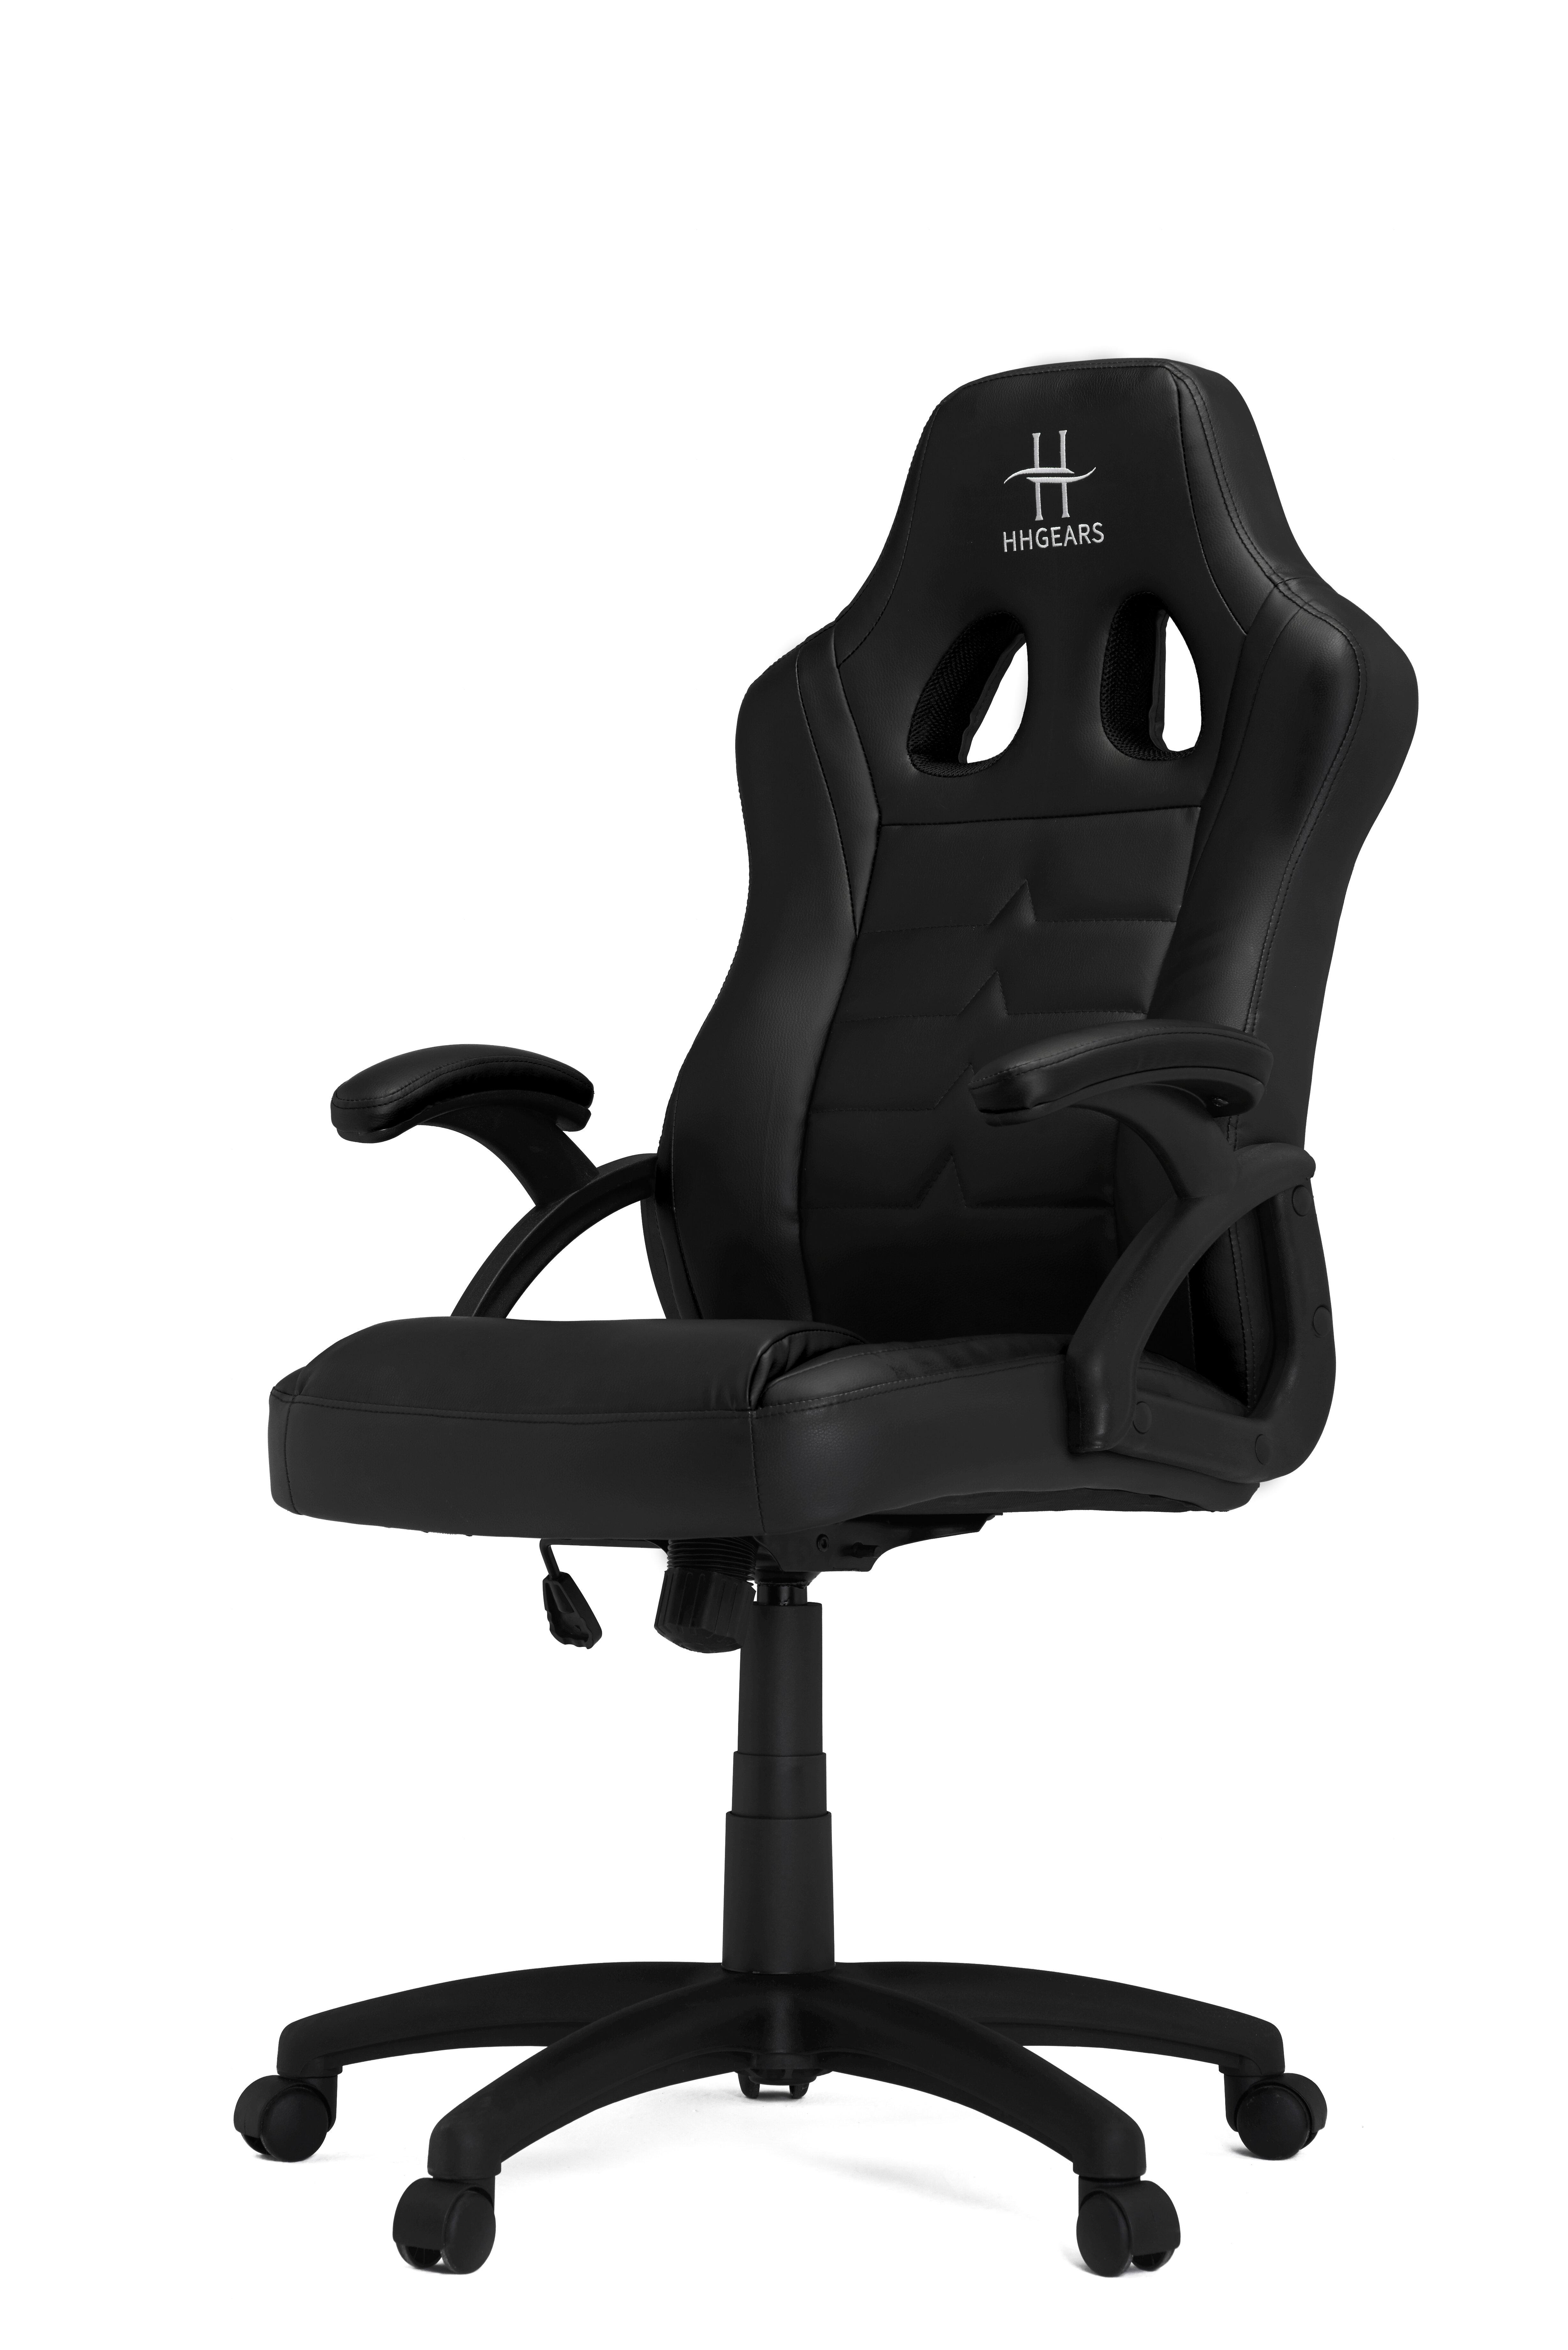 Awe Inspiring Hhgear Sm115 Series Racing Game Chair Uwap Interior Chair Design Uwaporg